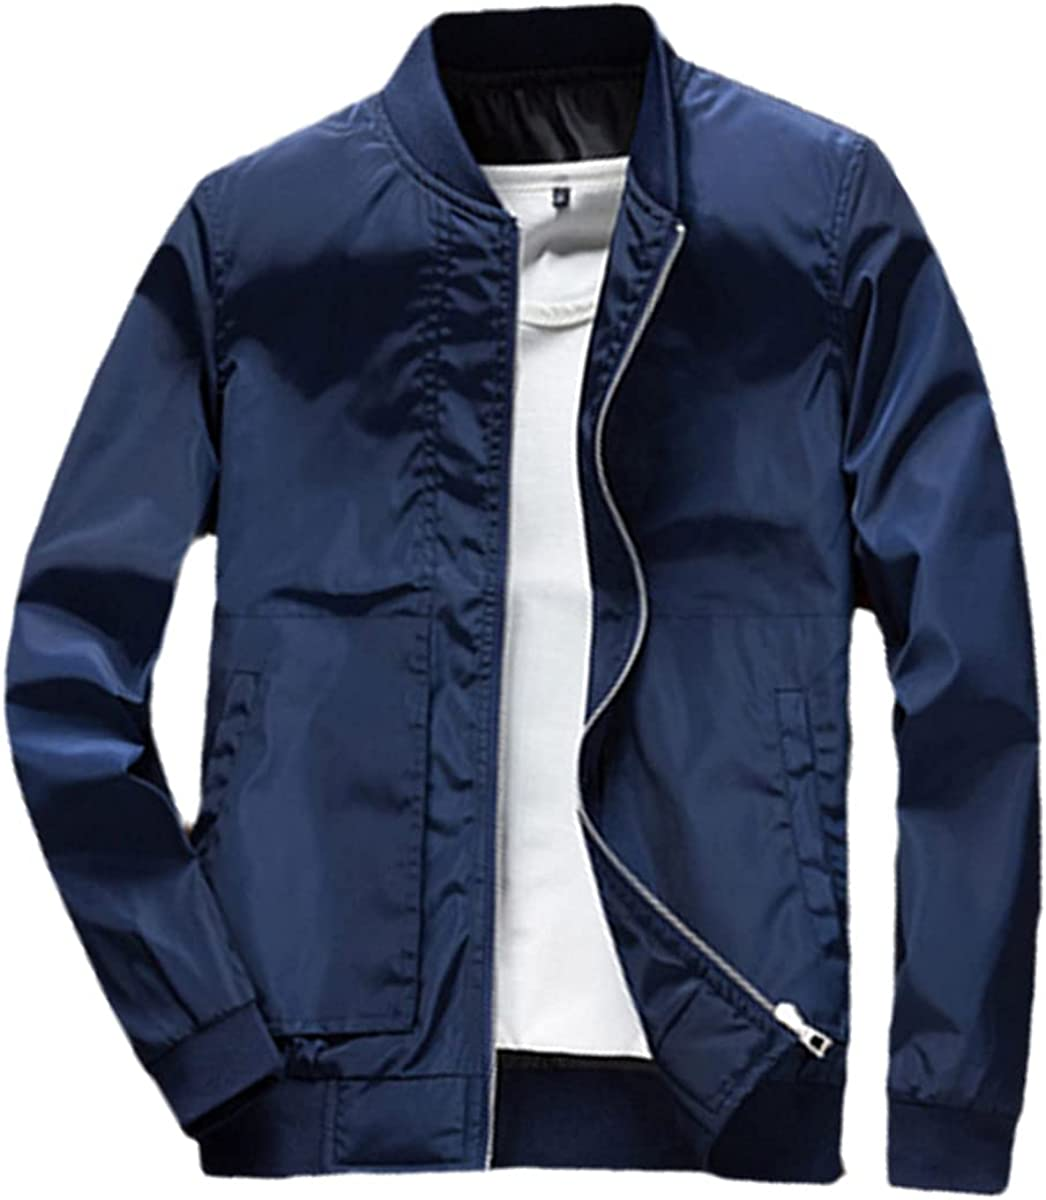 Men's Bomber Jacket Zipper Fashion Male Streetwear Hip-Hop Slim Fit Bomber Jacket Baseball Jacket